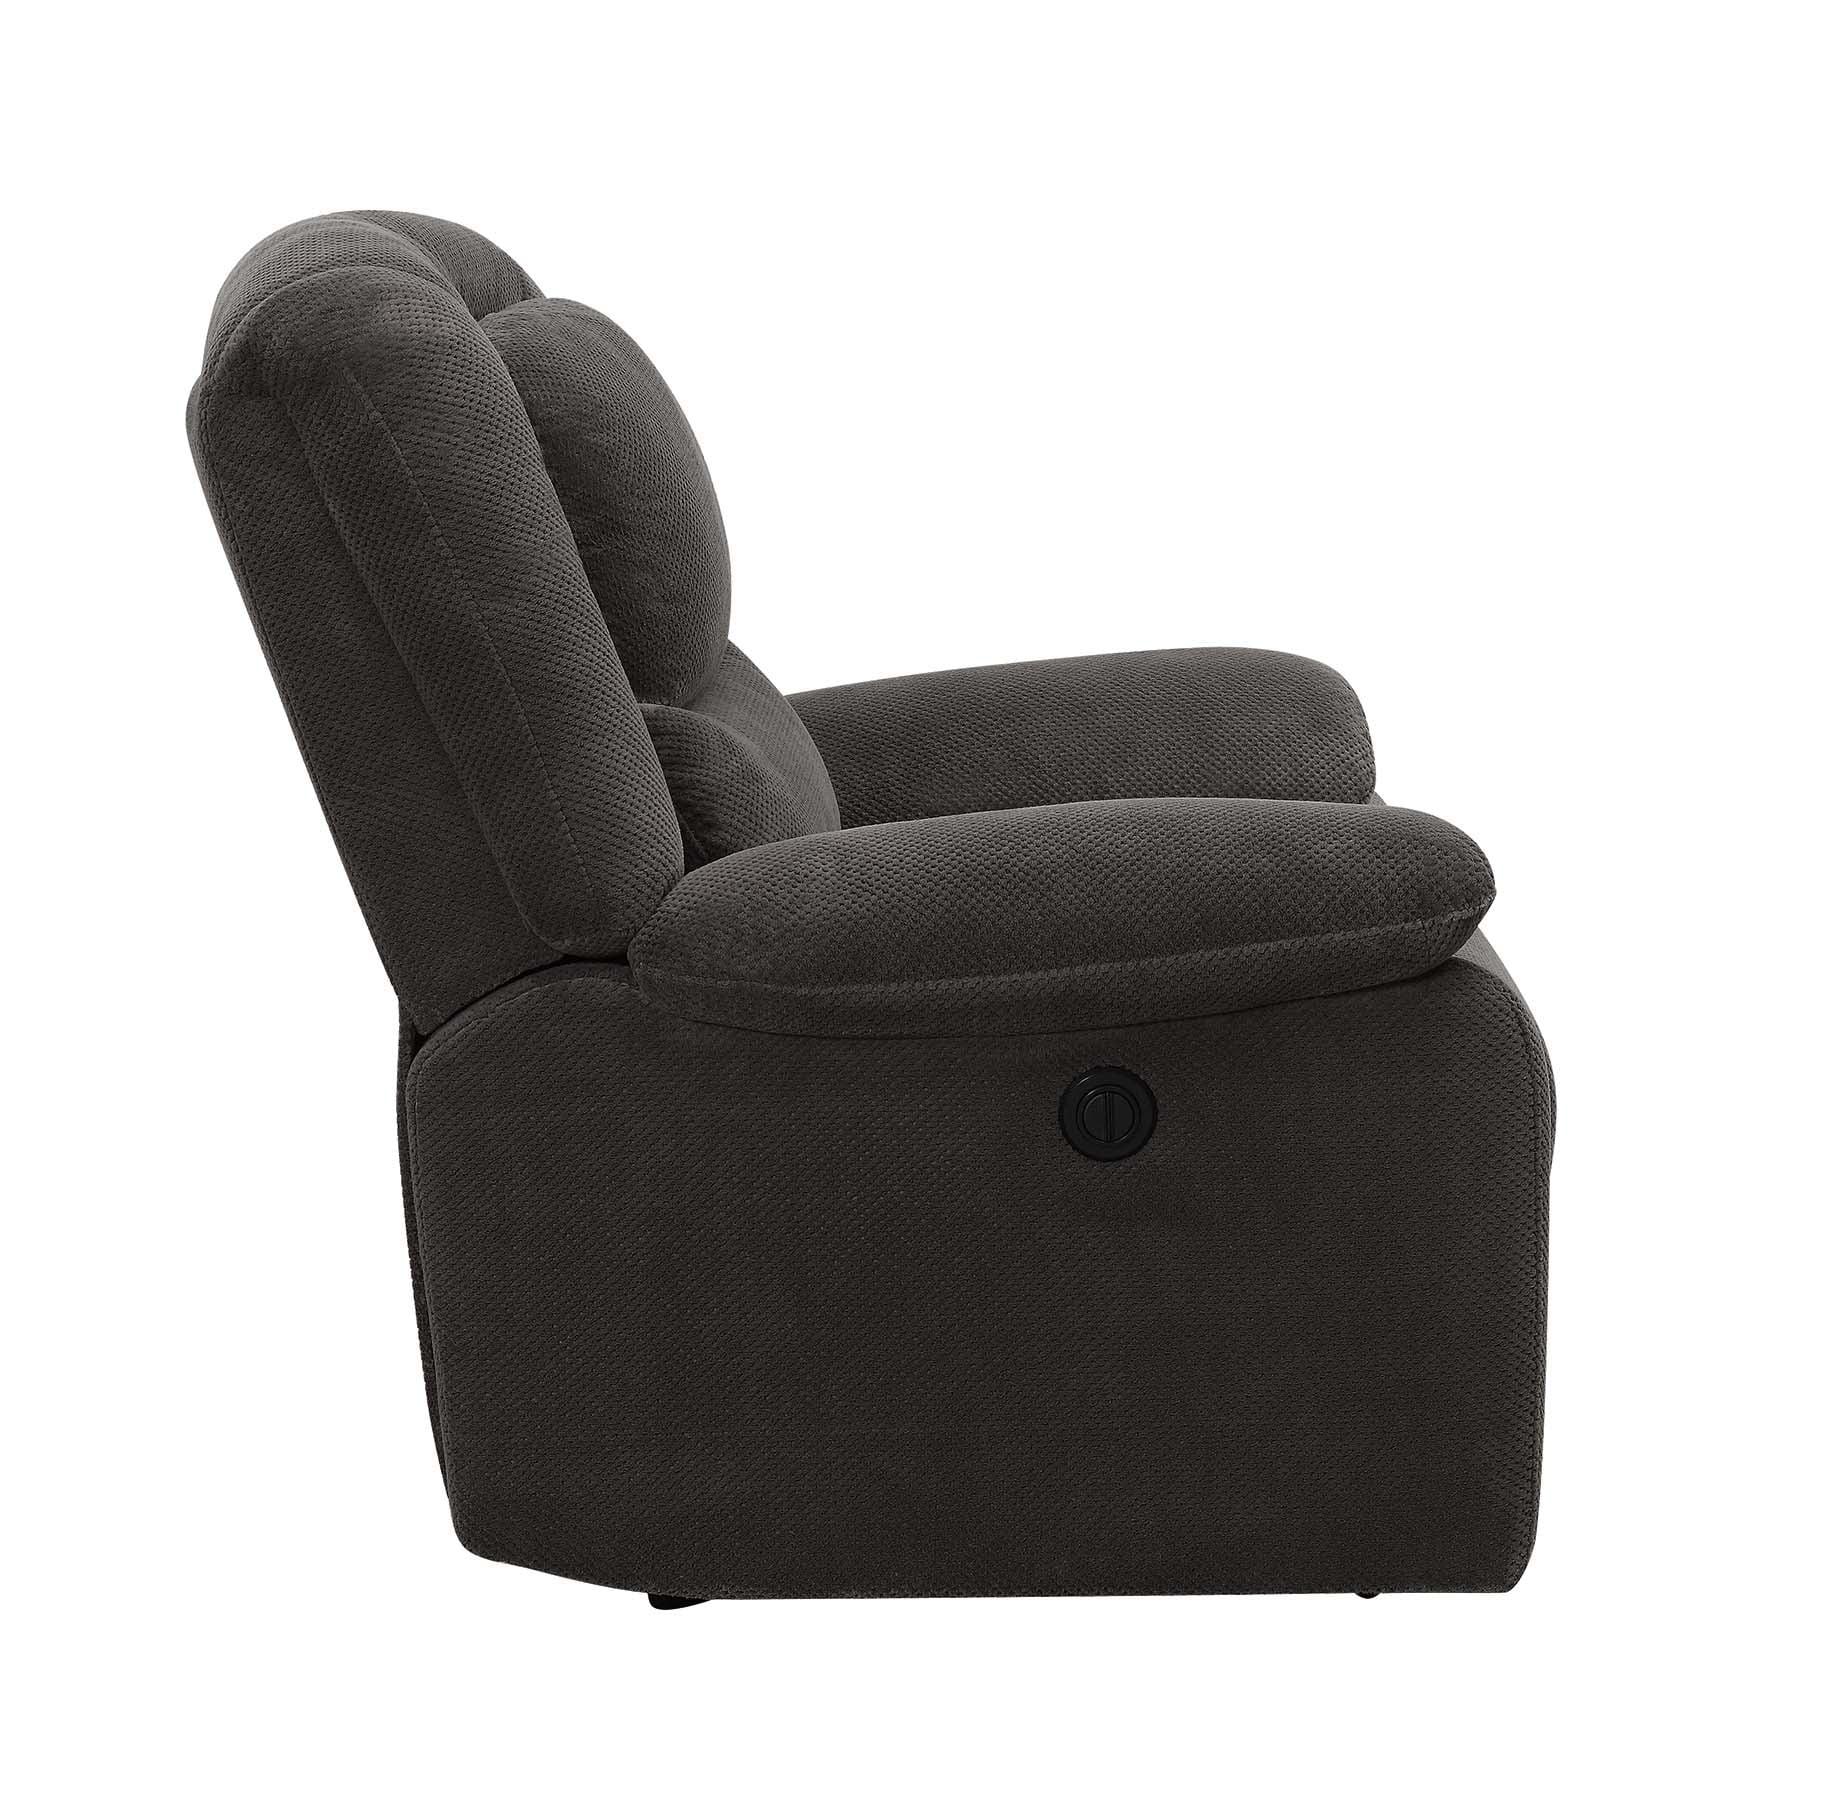 serta power recliner brown walmartcom cbe heated cooled chair